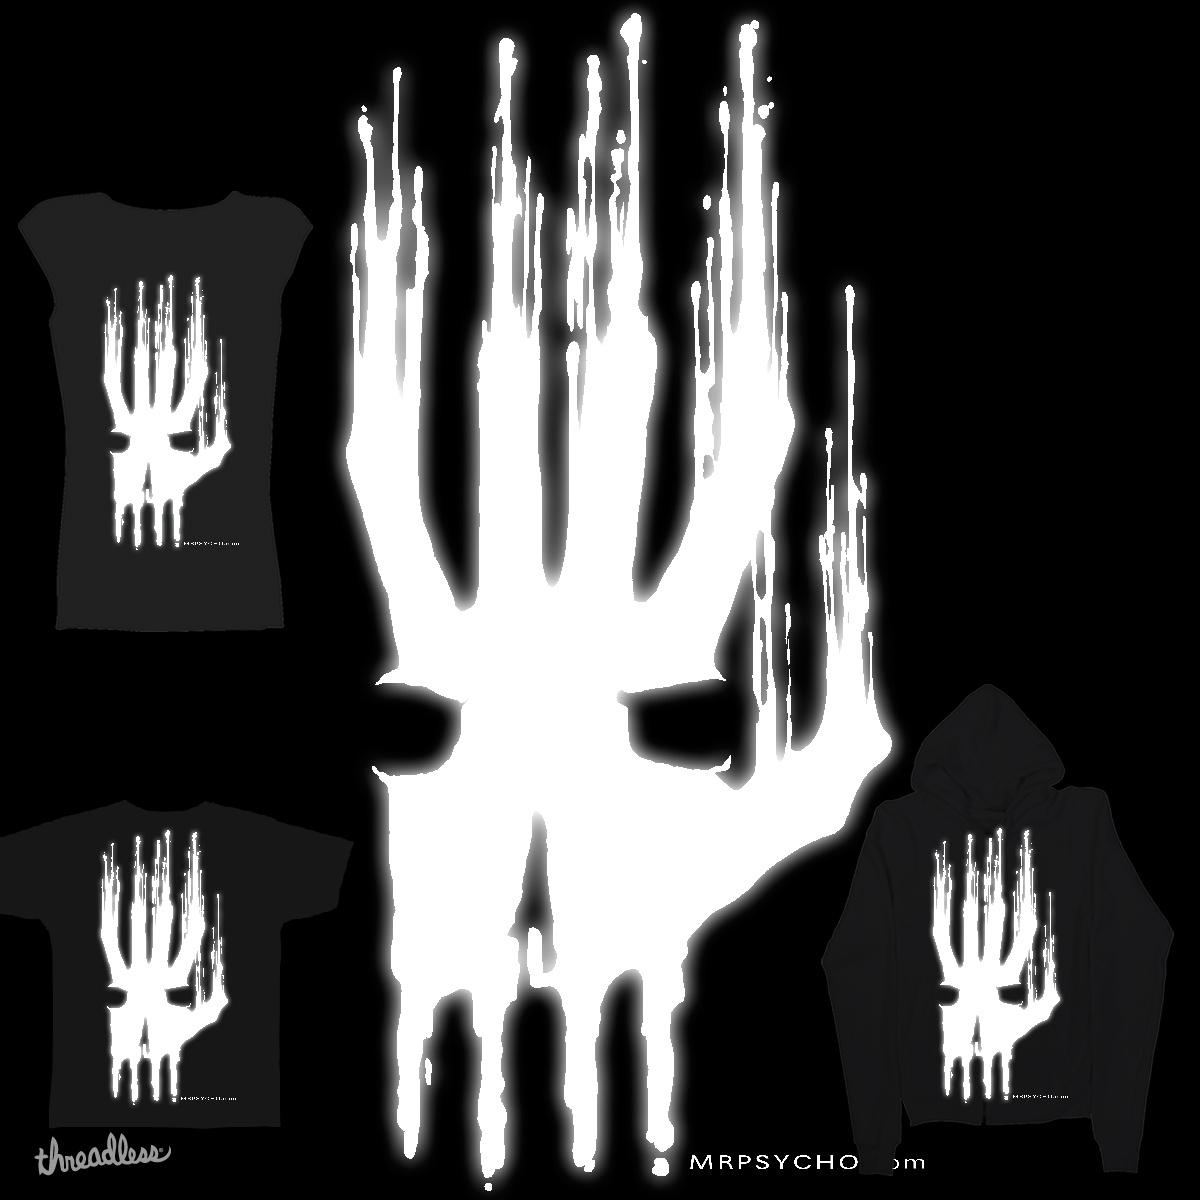 Skull in Hand by mrpsycho_slc on Threadless